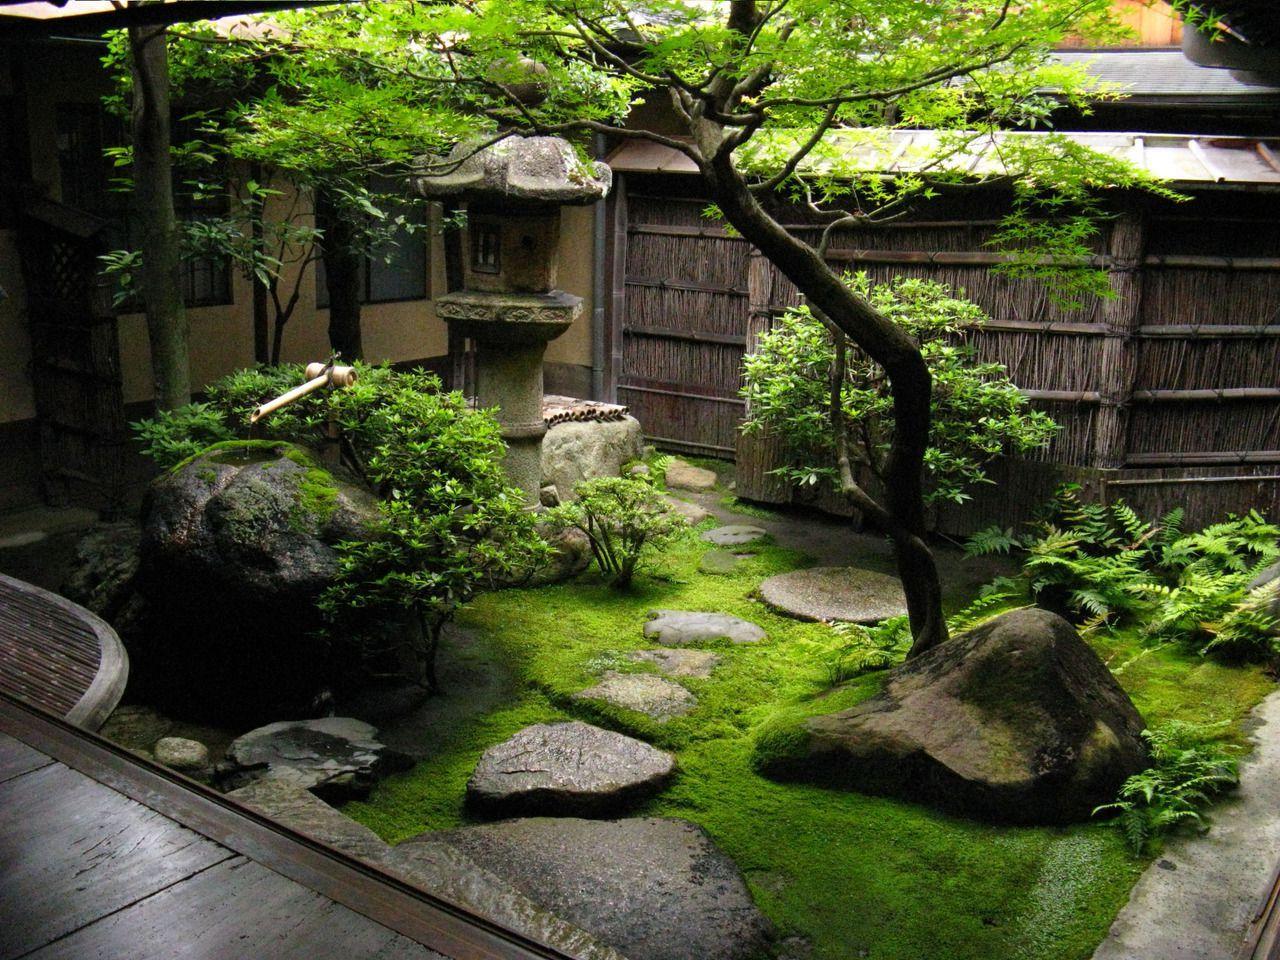 21 Zen Garden Ideas 2019 How To Build Zen Garden Landscaping Ideas Miniature Backyard Zengar Japanese Rock Garden Small Japanese Garden Japanese Garden